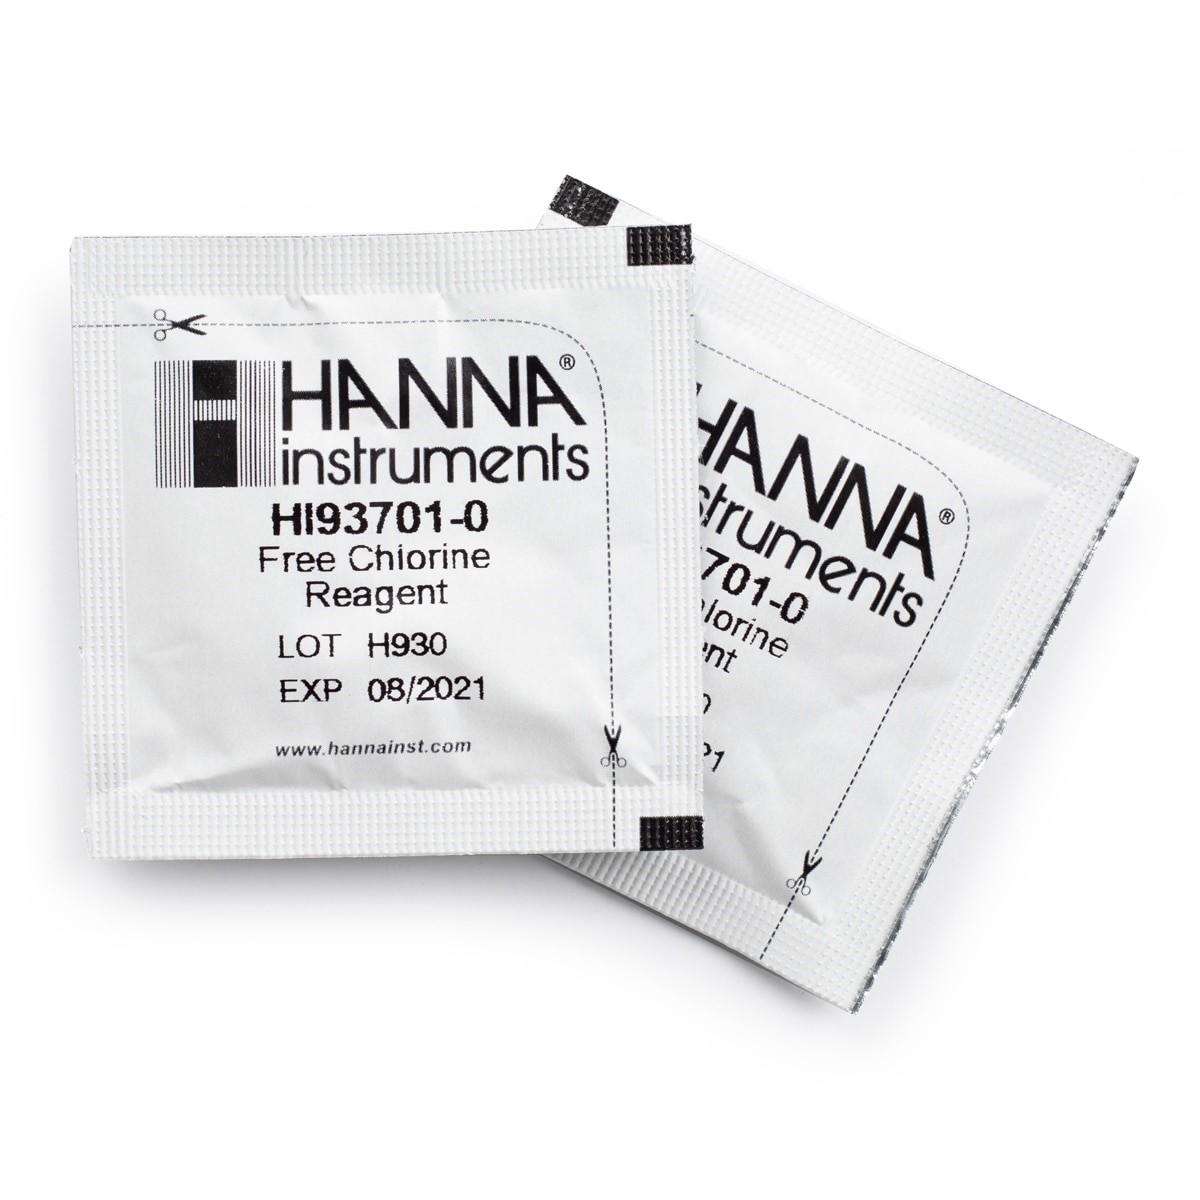 HI93701-03 Free Chlorine Reagents (300 tests)